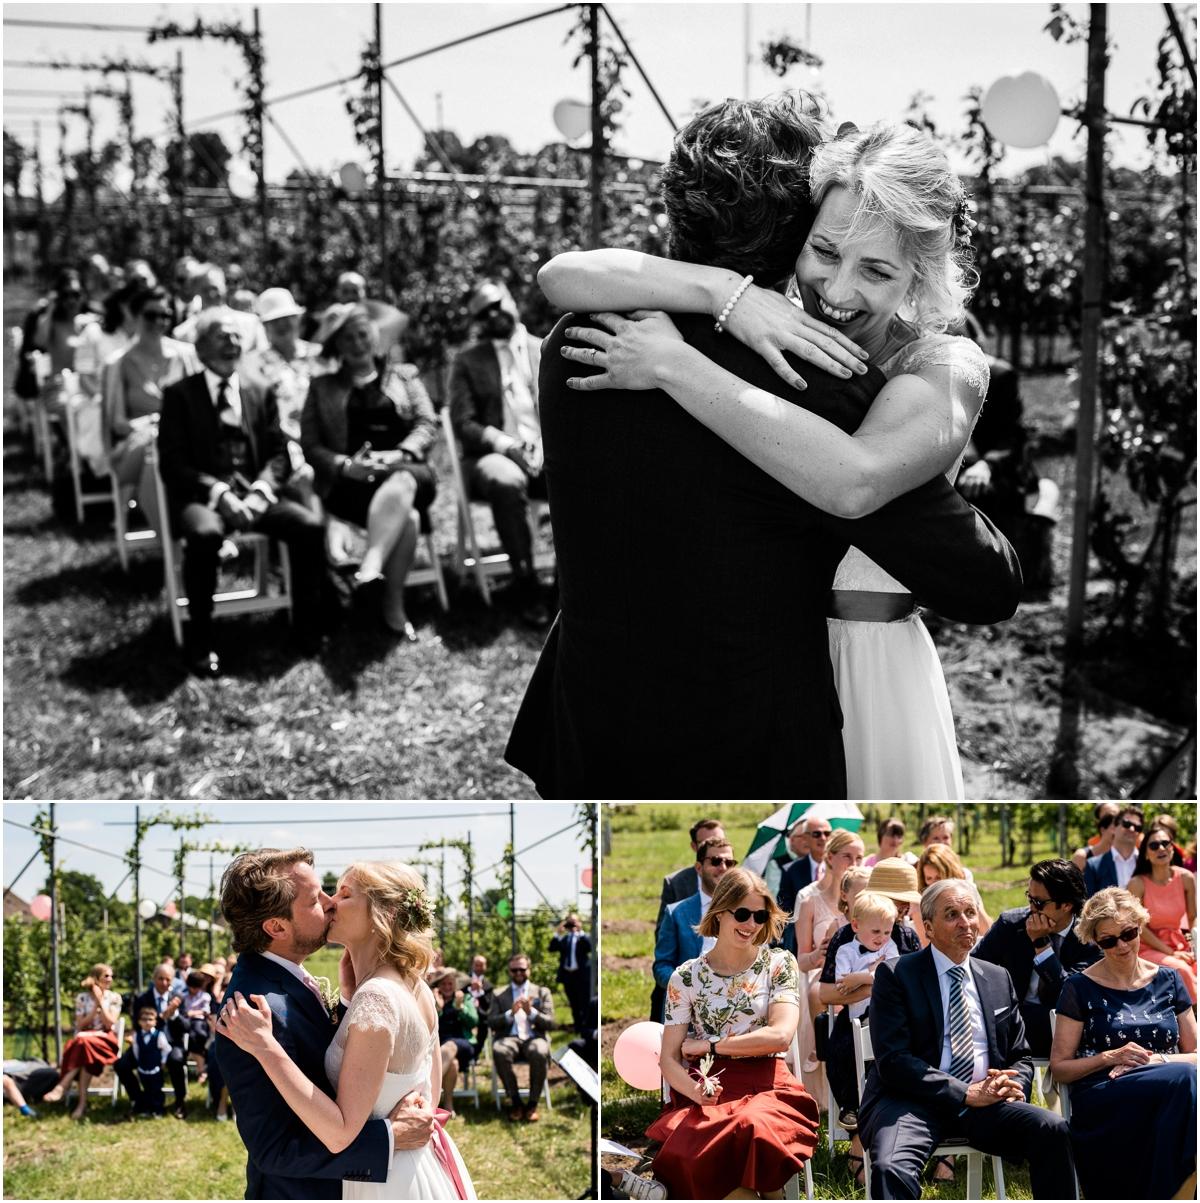 Dayofmylife-trouwen-fruittuinverbeek-bruidsfotograaf-wedding-germany-dutch10